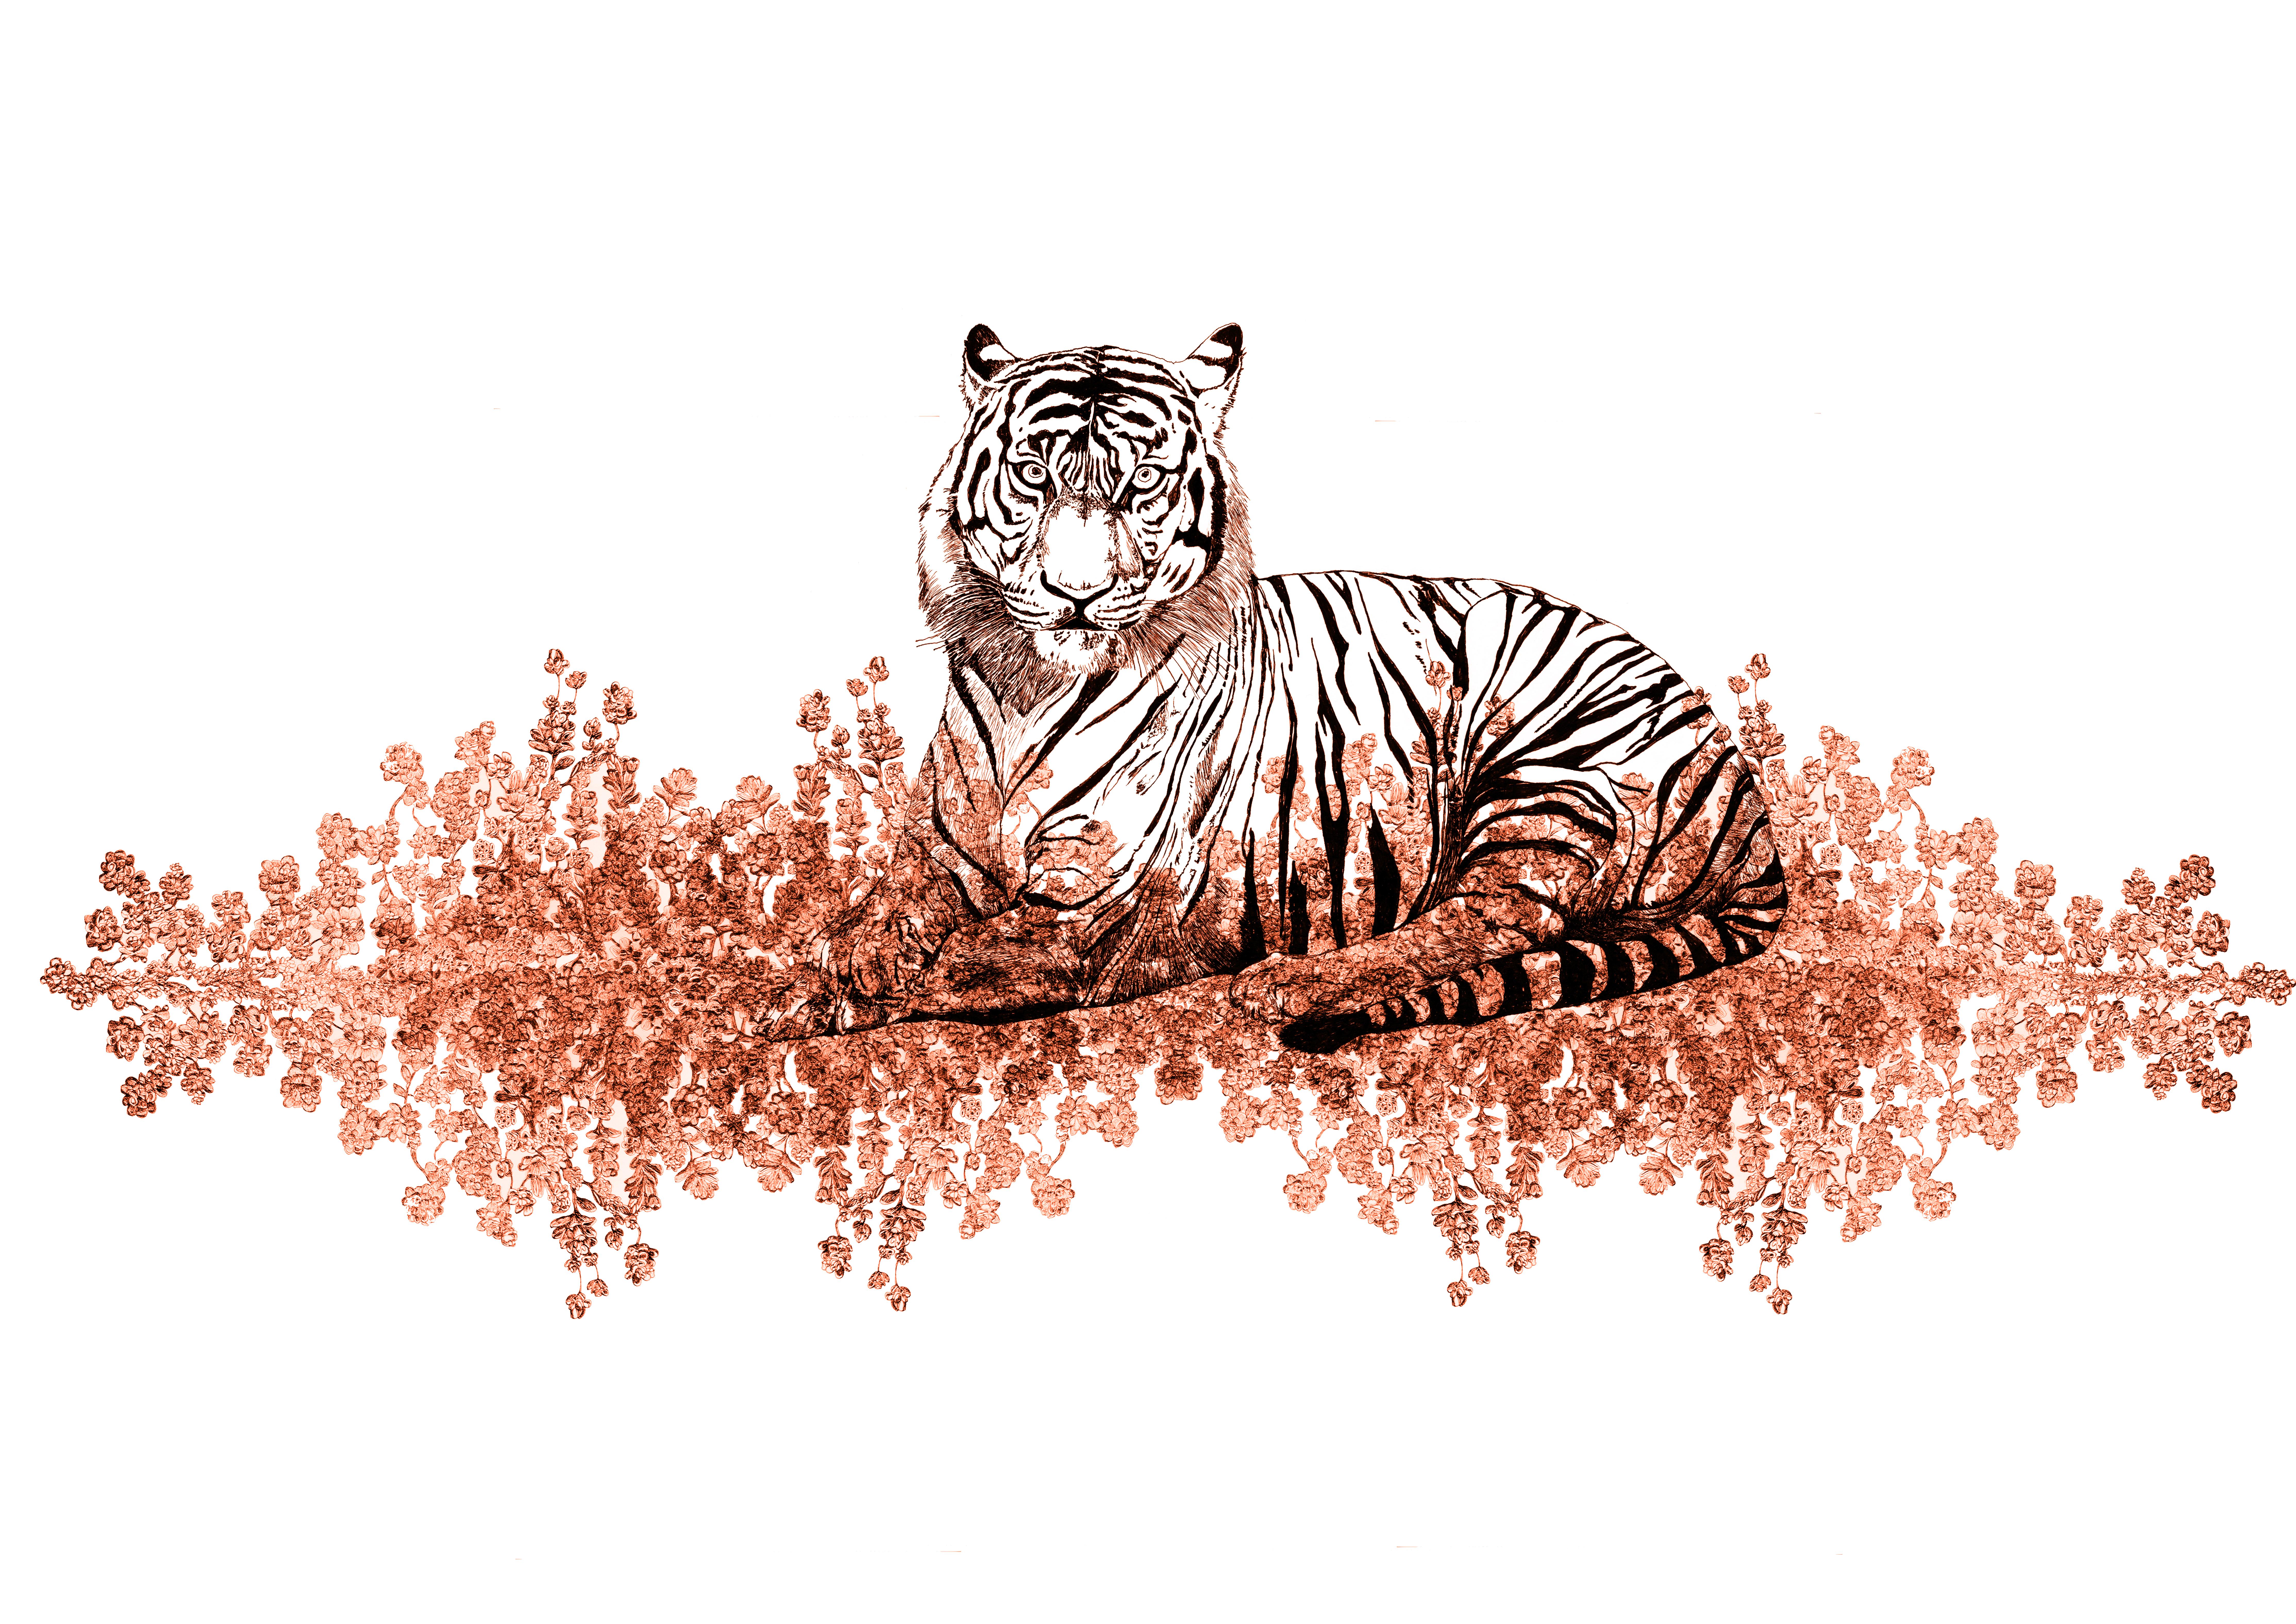 tigris aureus coronare franck auguste pi